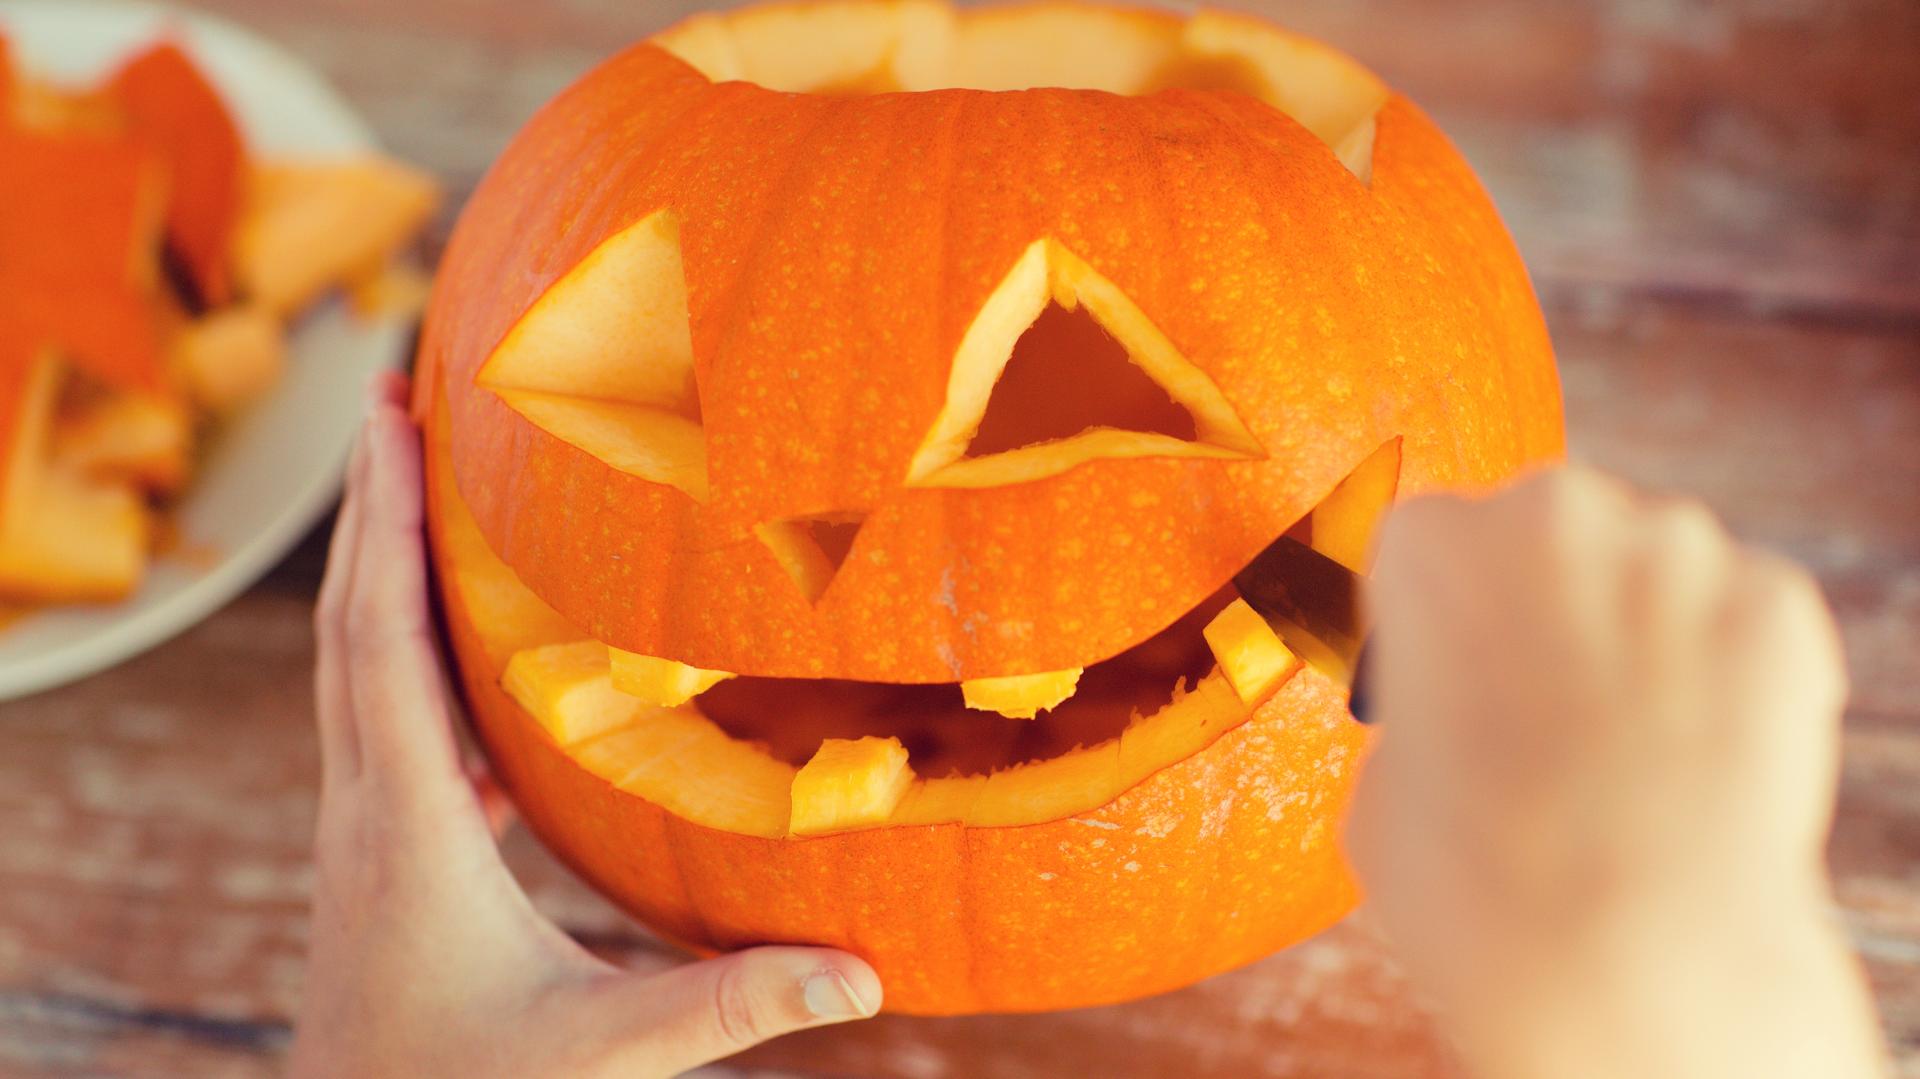 Pumpkin carving tools that ll help you carve the most kick ass